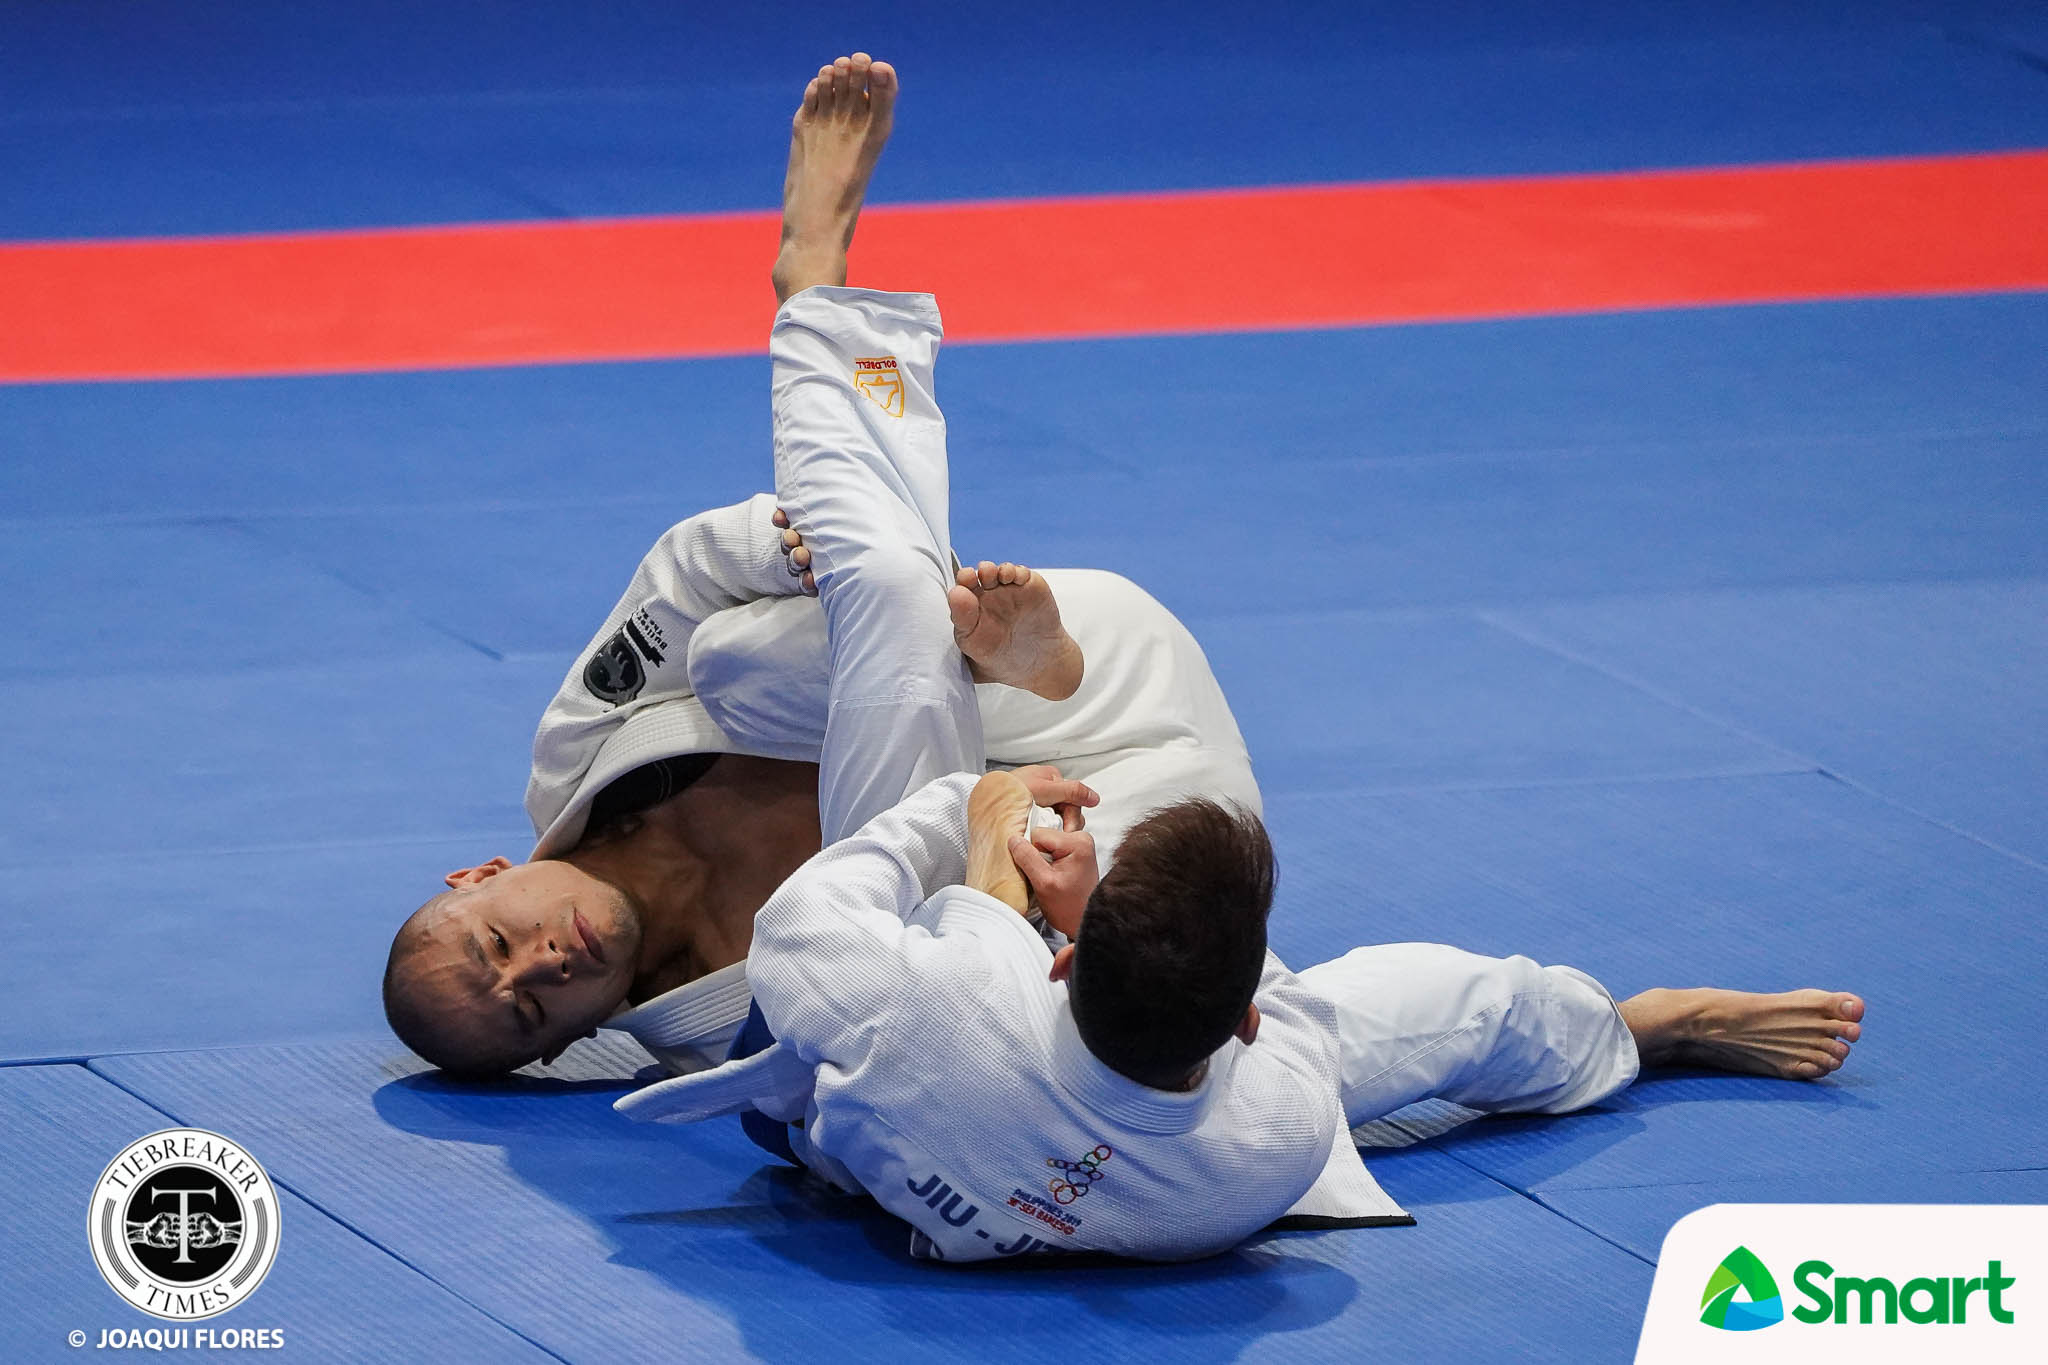 Tiebreaker Times Carlo Peña rules SEAG jiu jitsu 56kg 2019 SEA Games Brazilian Jiu Jitsu News  Carlo Pena 2019 SEA Games - Jiu Jitsu 2019 SEA Games